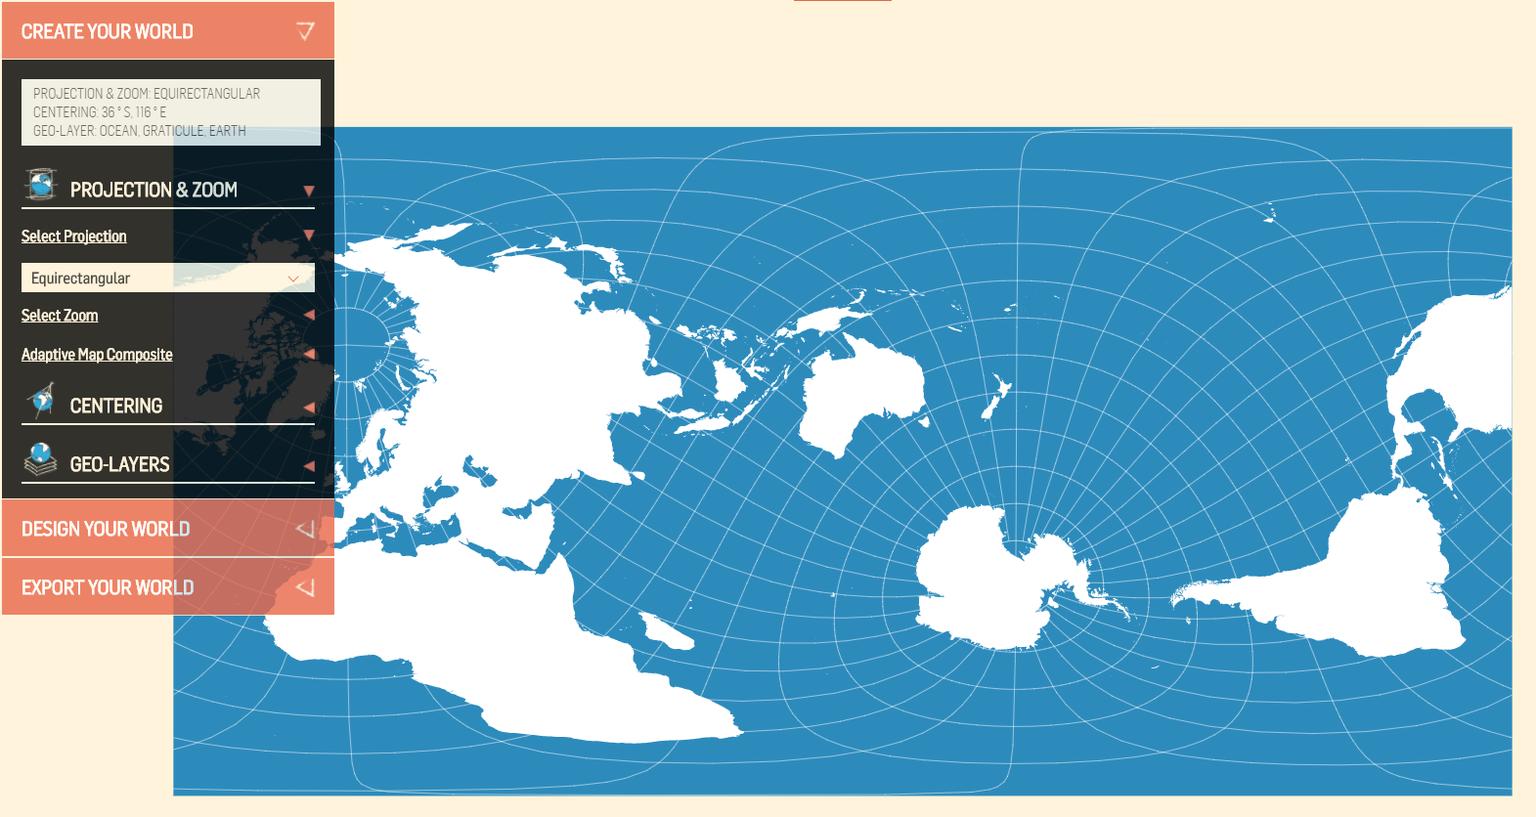 Worldmapcreator Com Gratis Eigene Weltkarten Erstellen Direkt Im